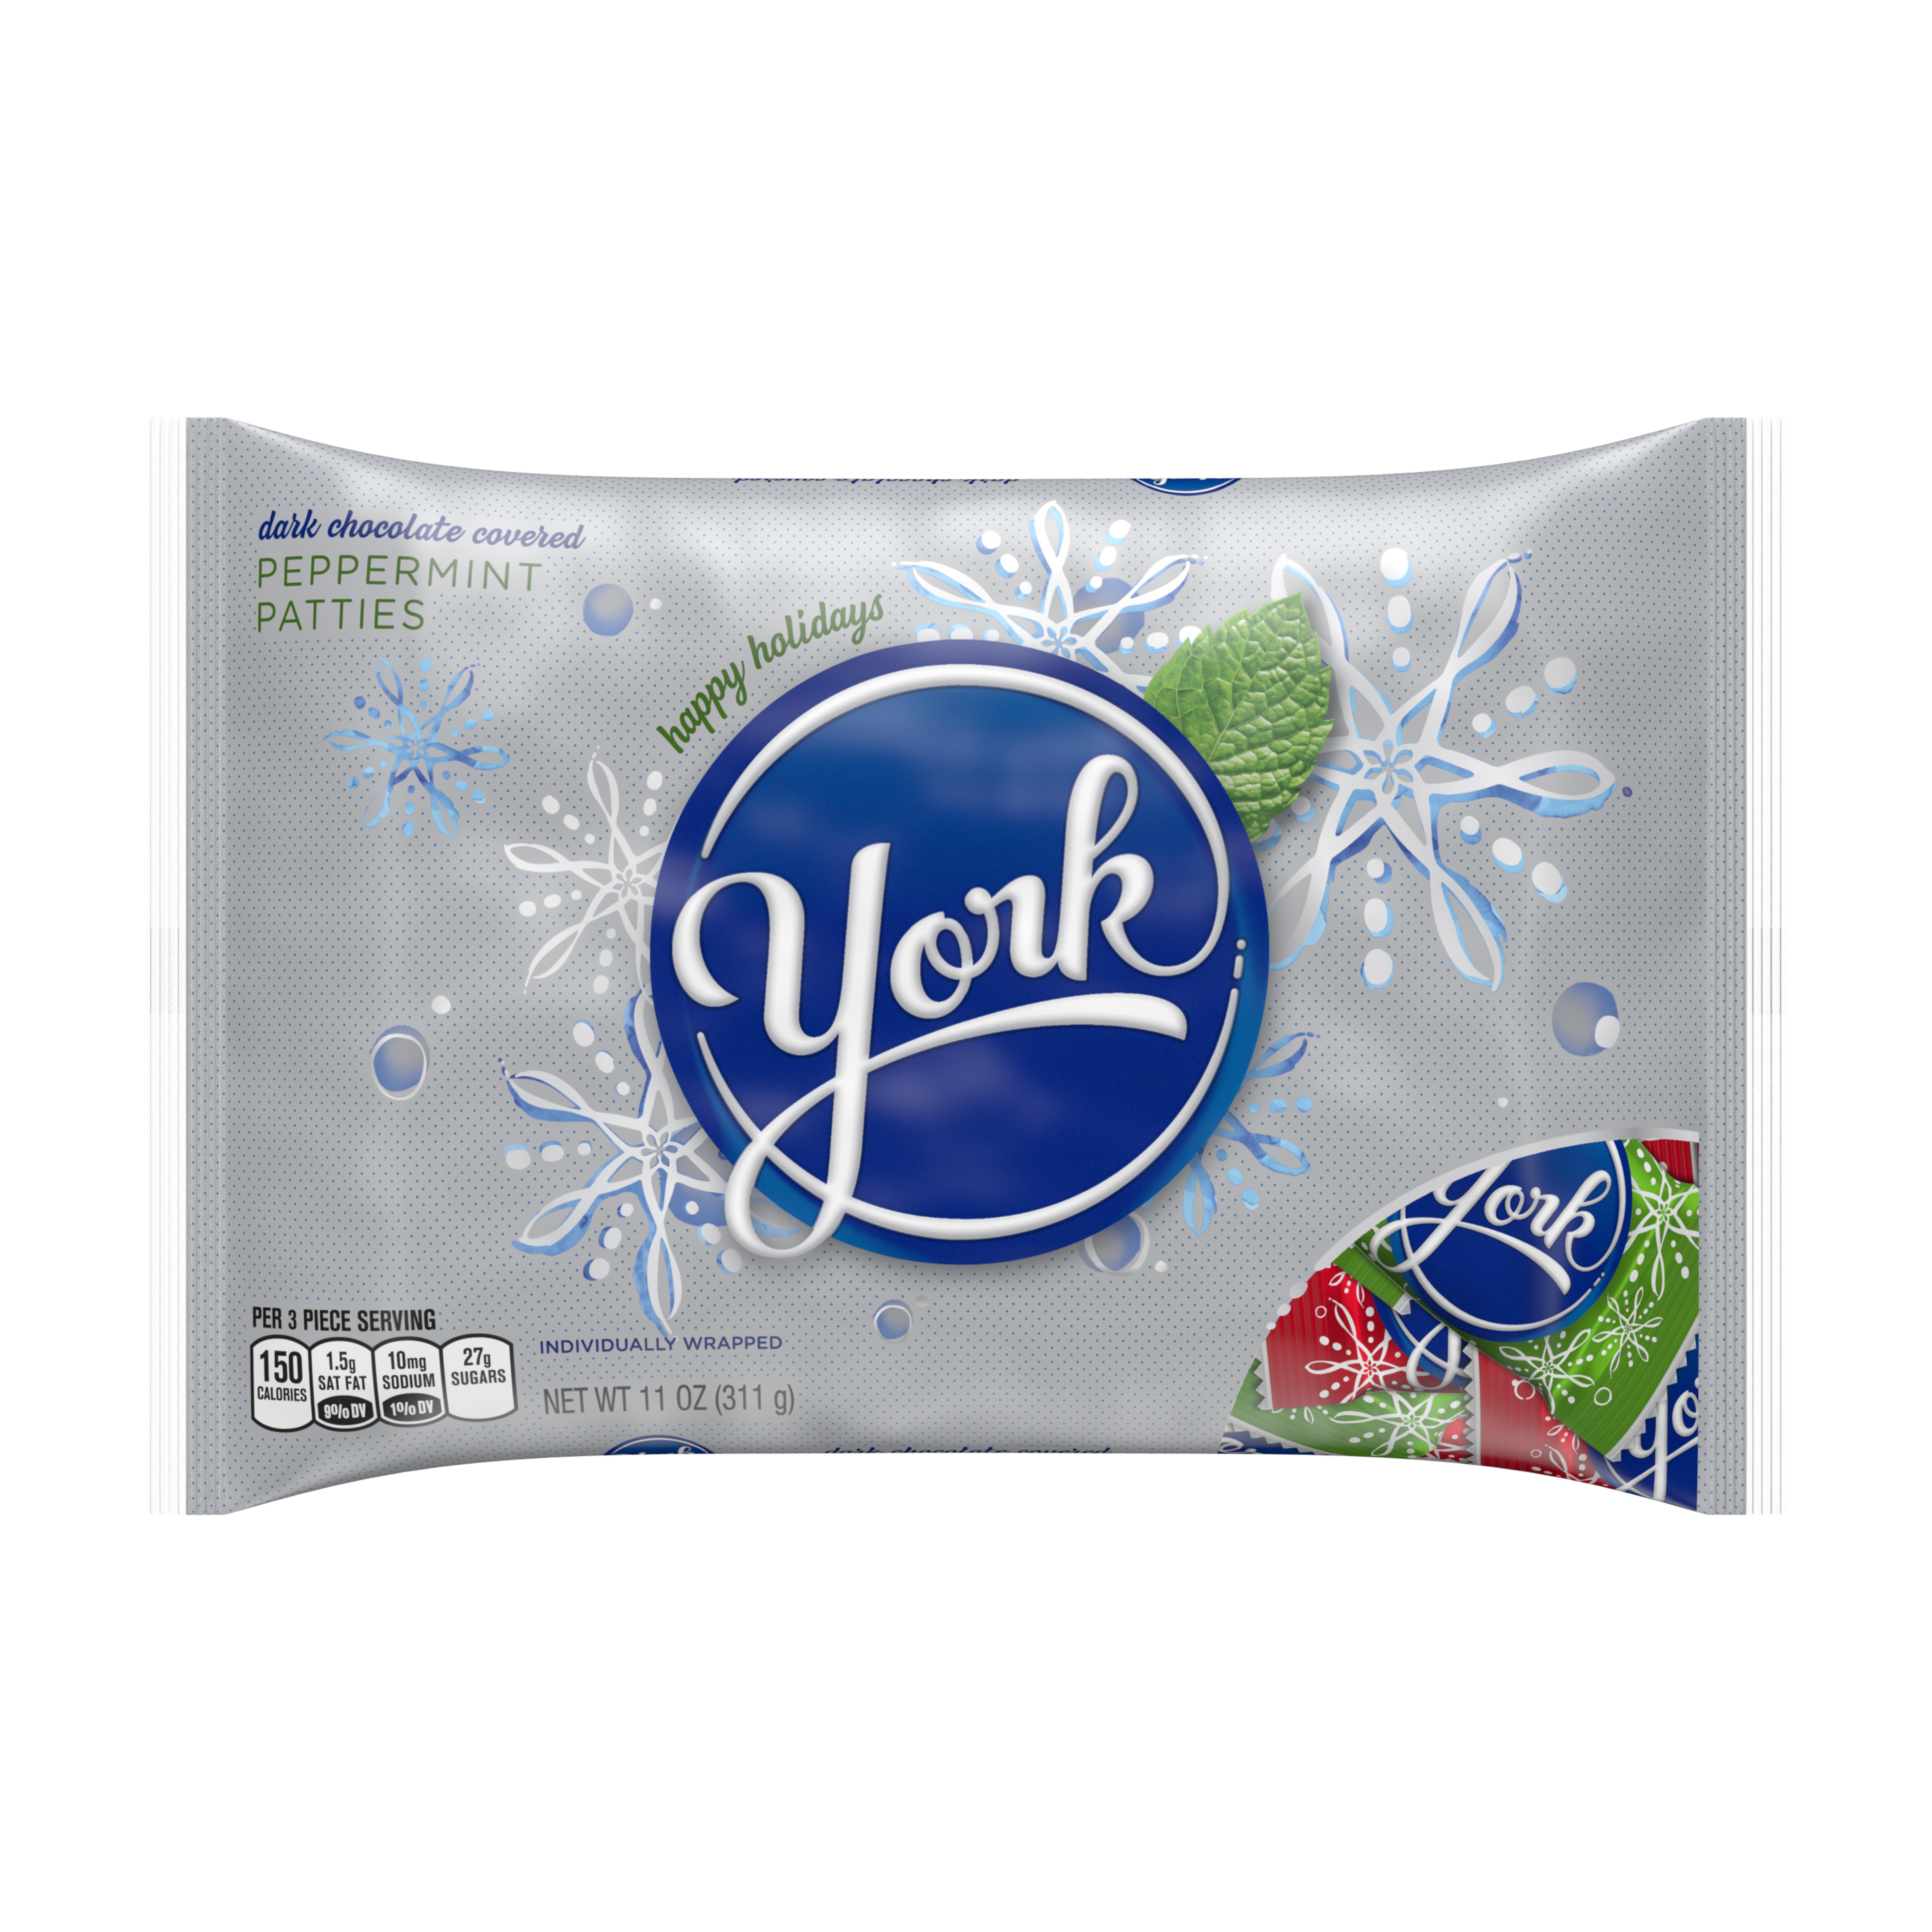 YORK Holiday Peppermint Patties, 11 oz